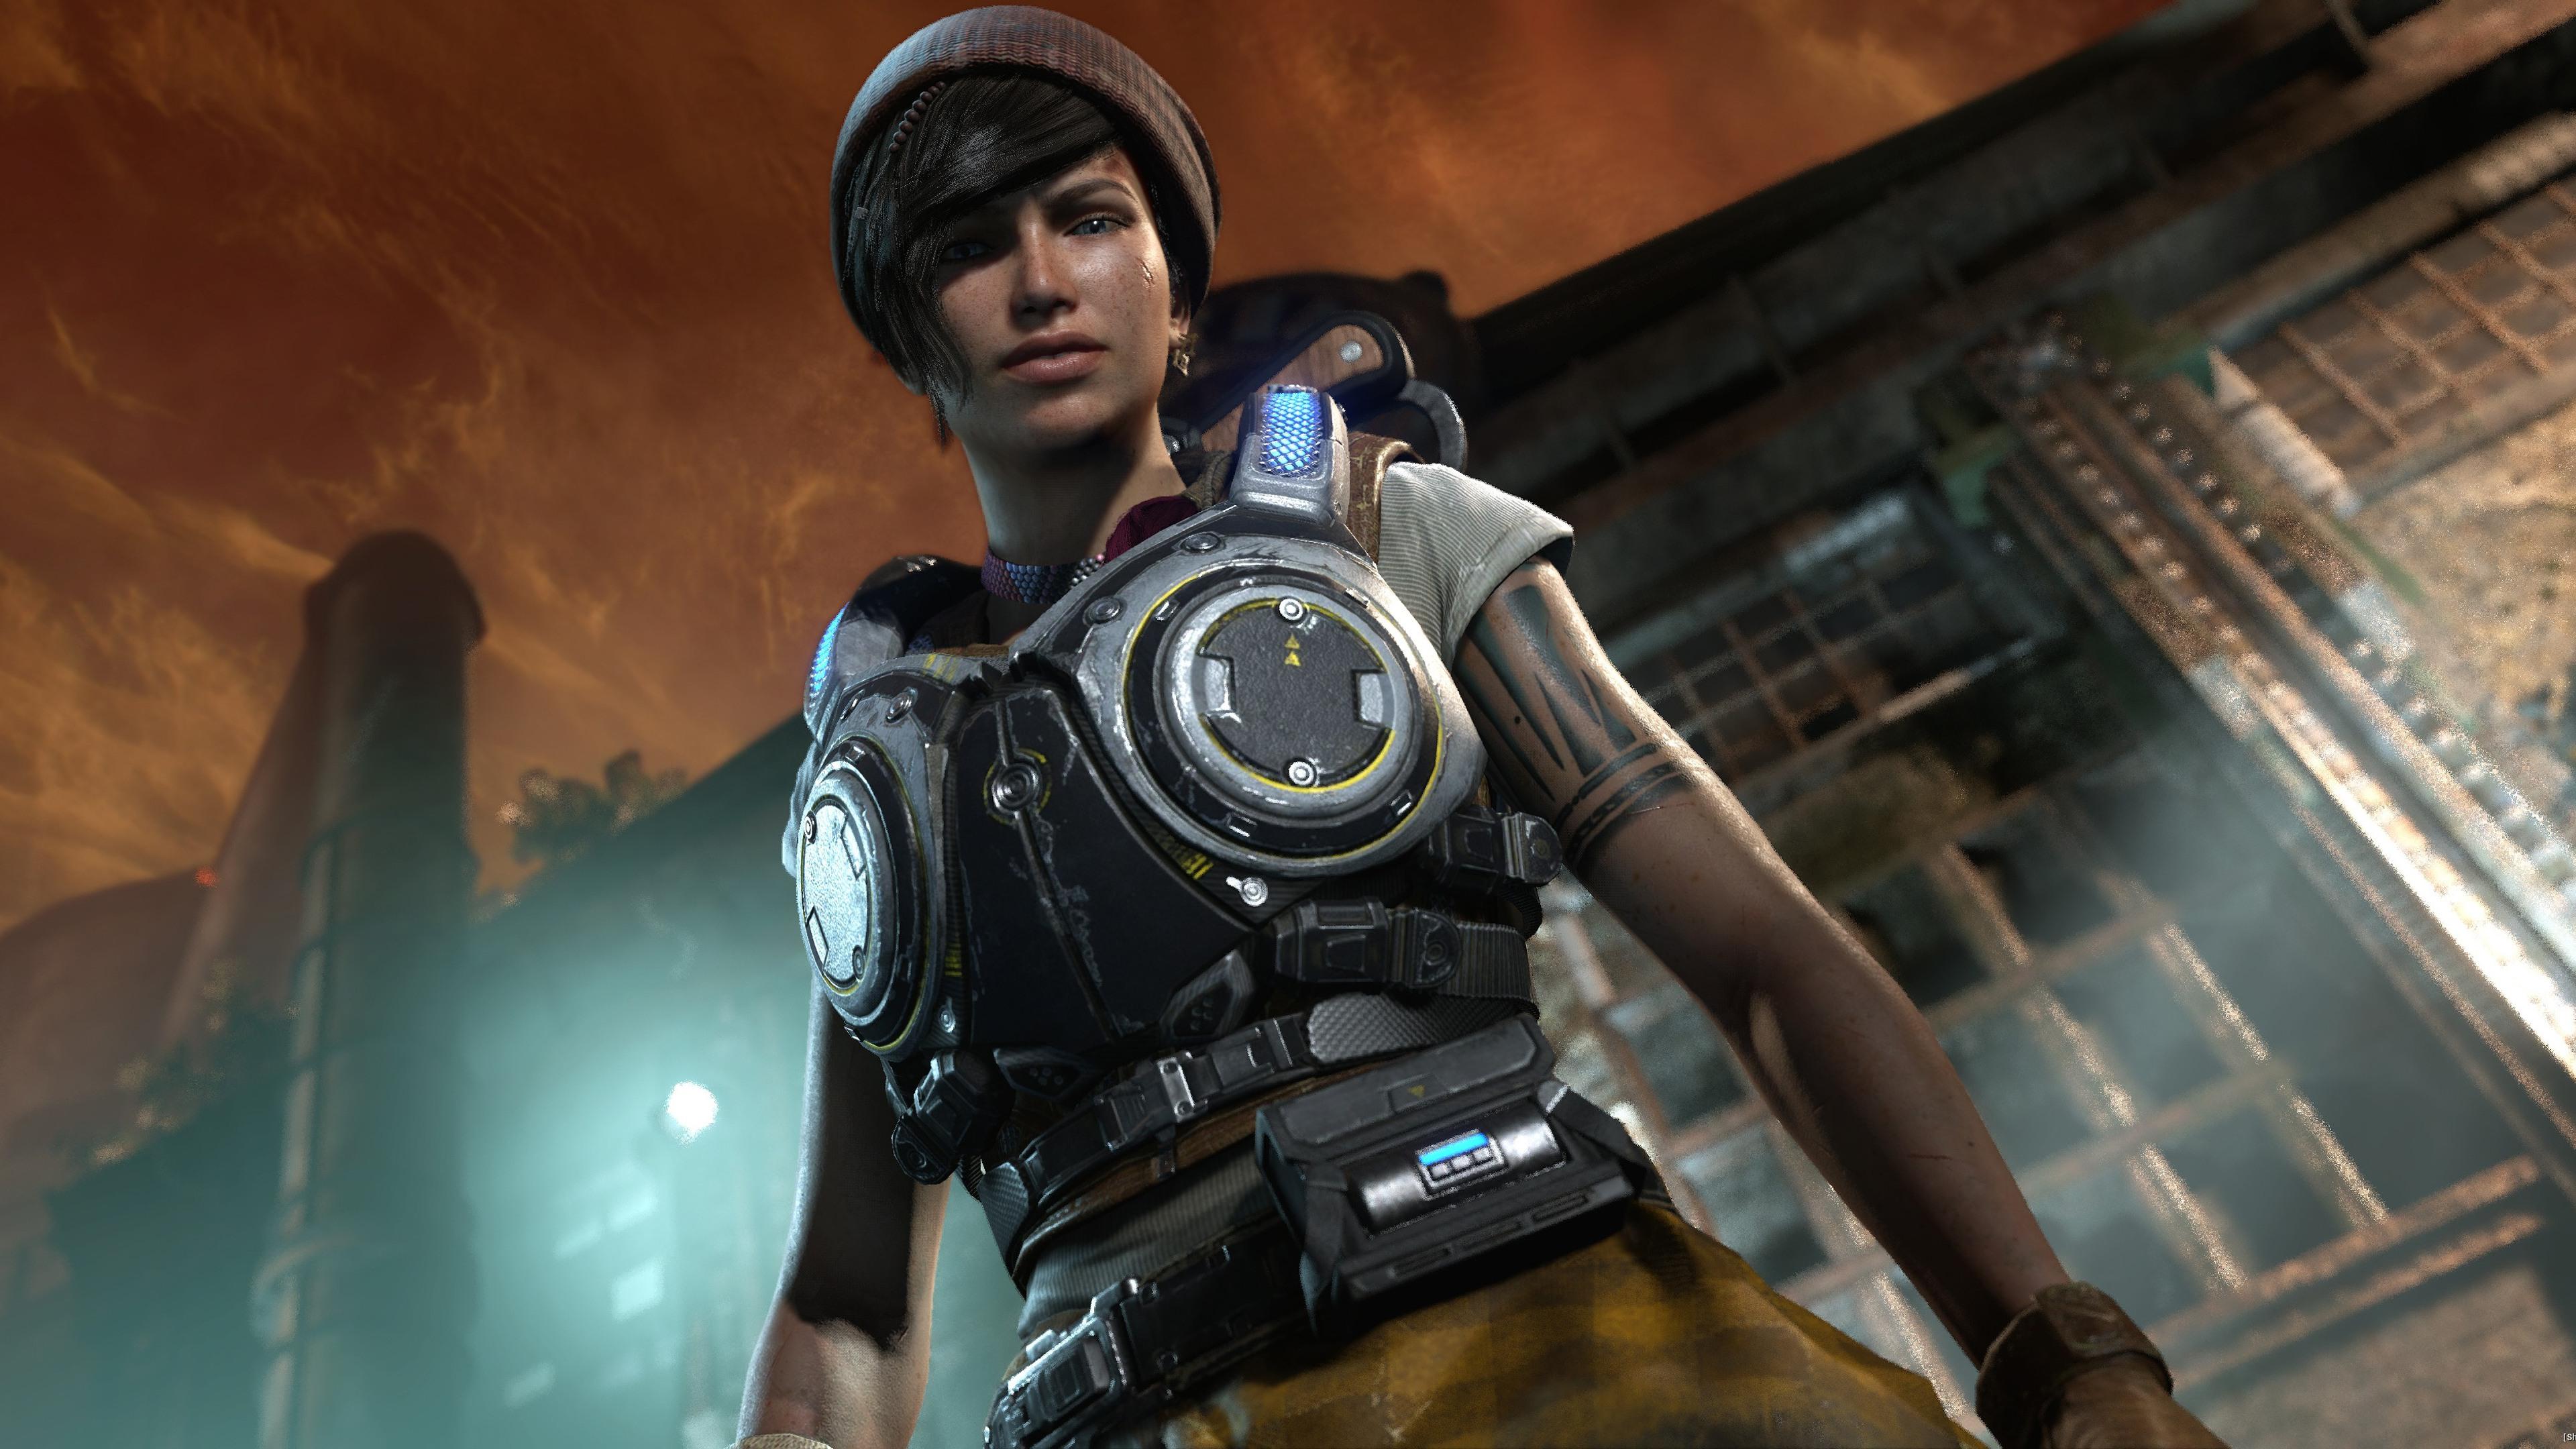 Kait Diaz Gears Of War 4 обои скачать